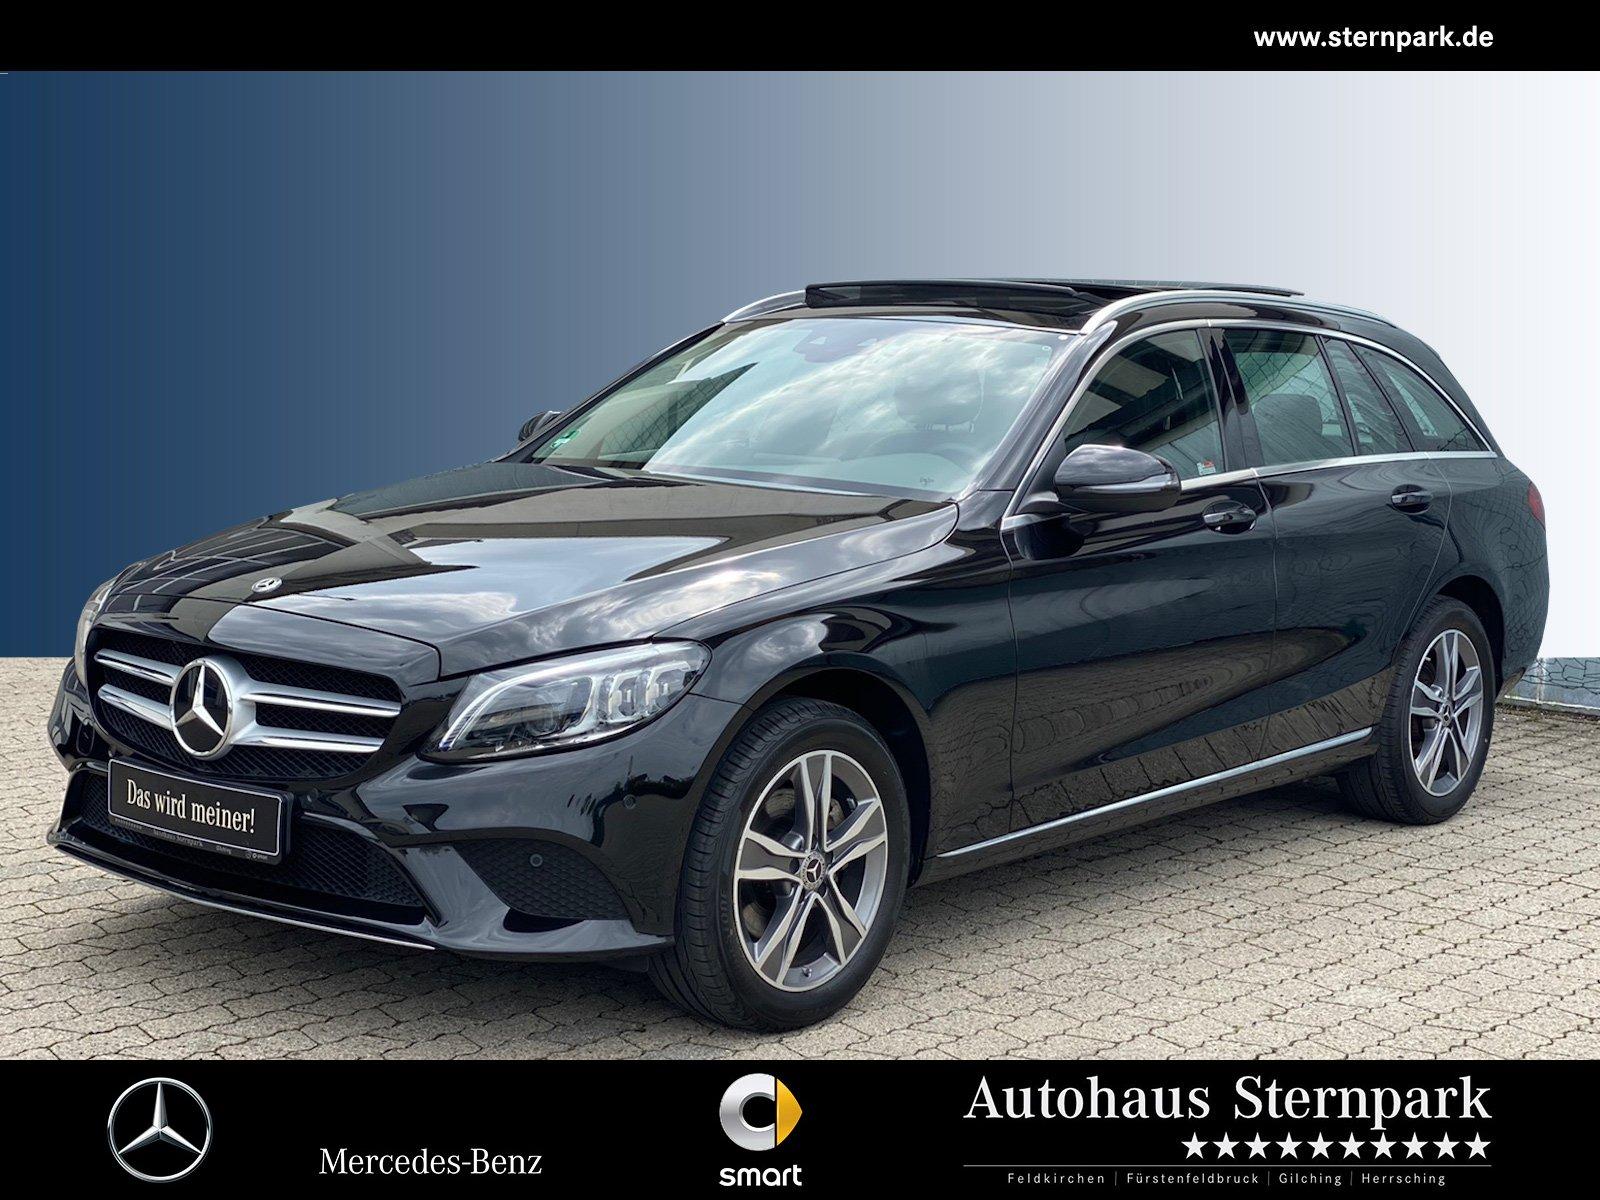 Mercedes-Benz C 200 4M T-Avantgarde Comand+Pano+Kamera+LED+AHK, Jahr 2019, Benzin